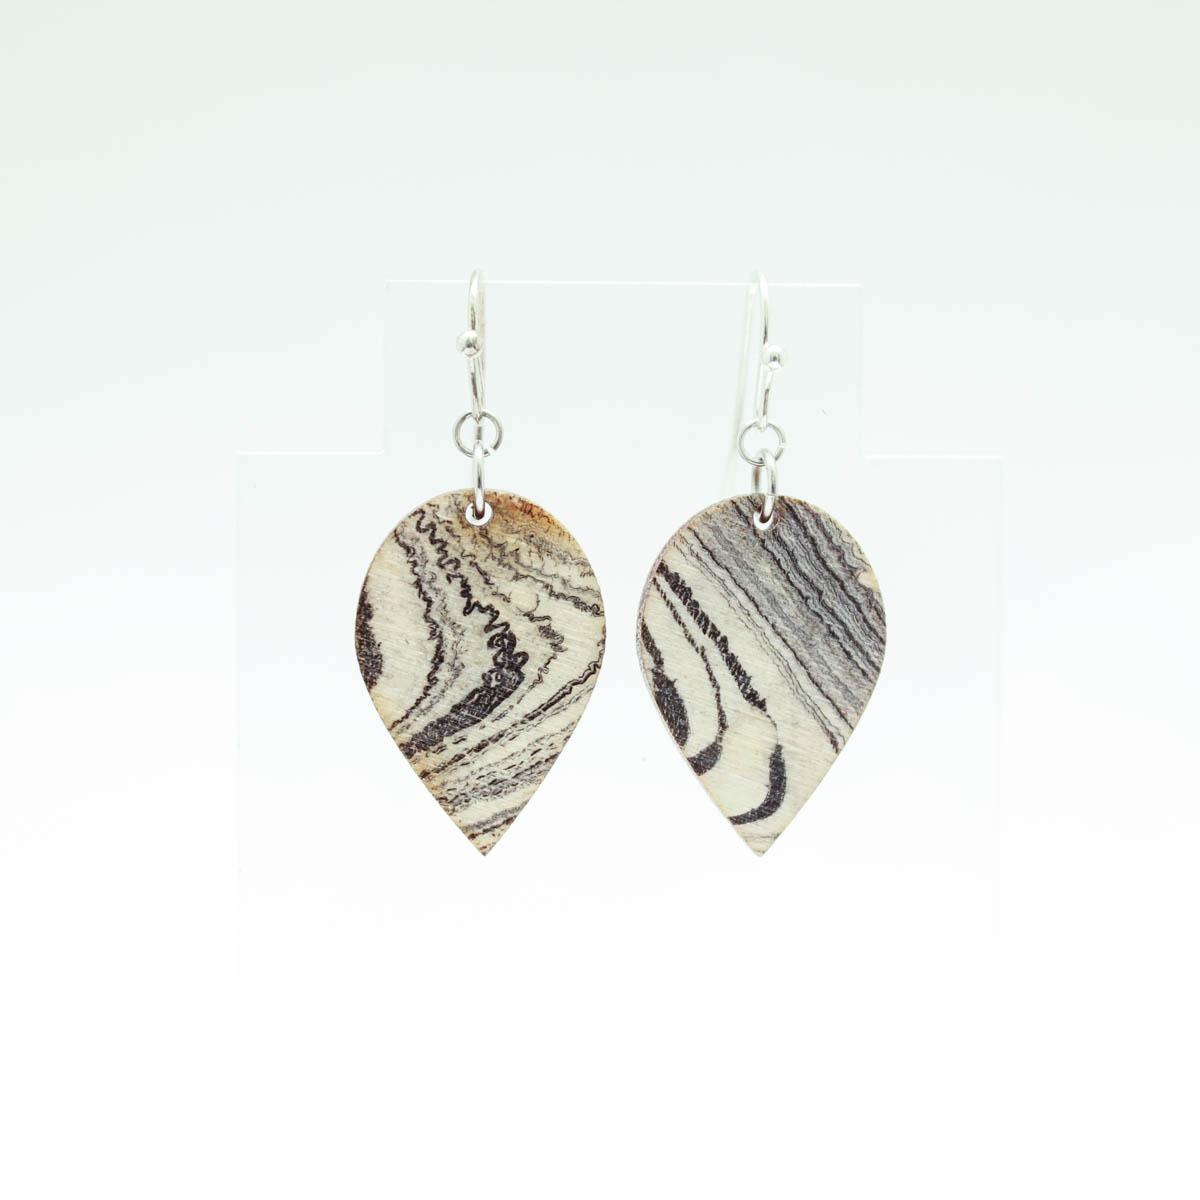 Marbled Leaflet Earrings